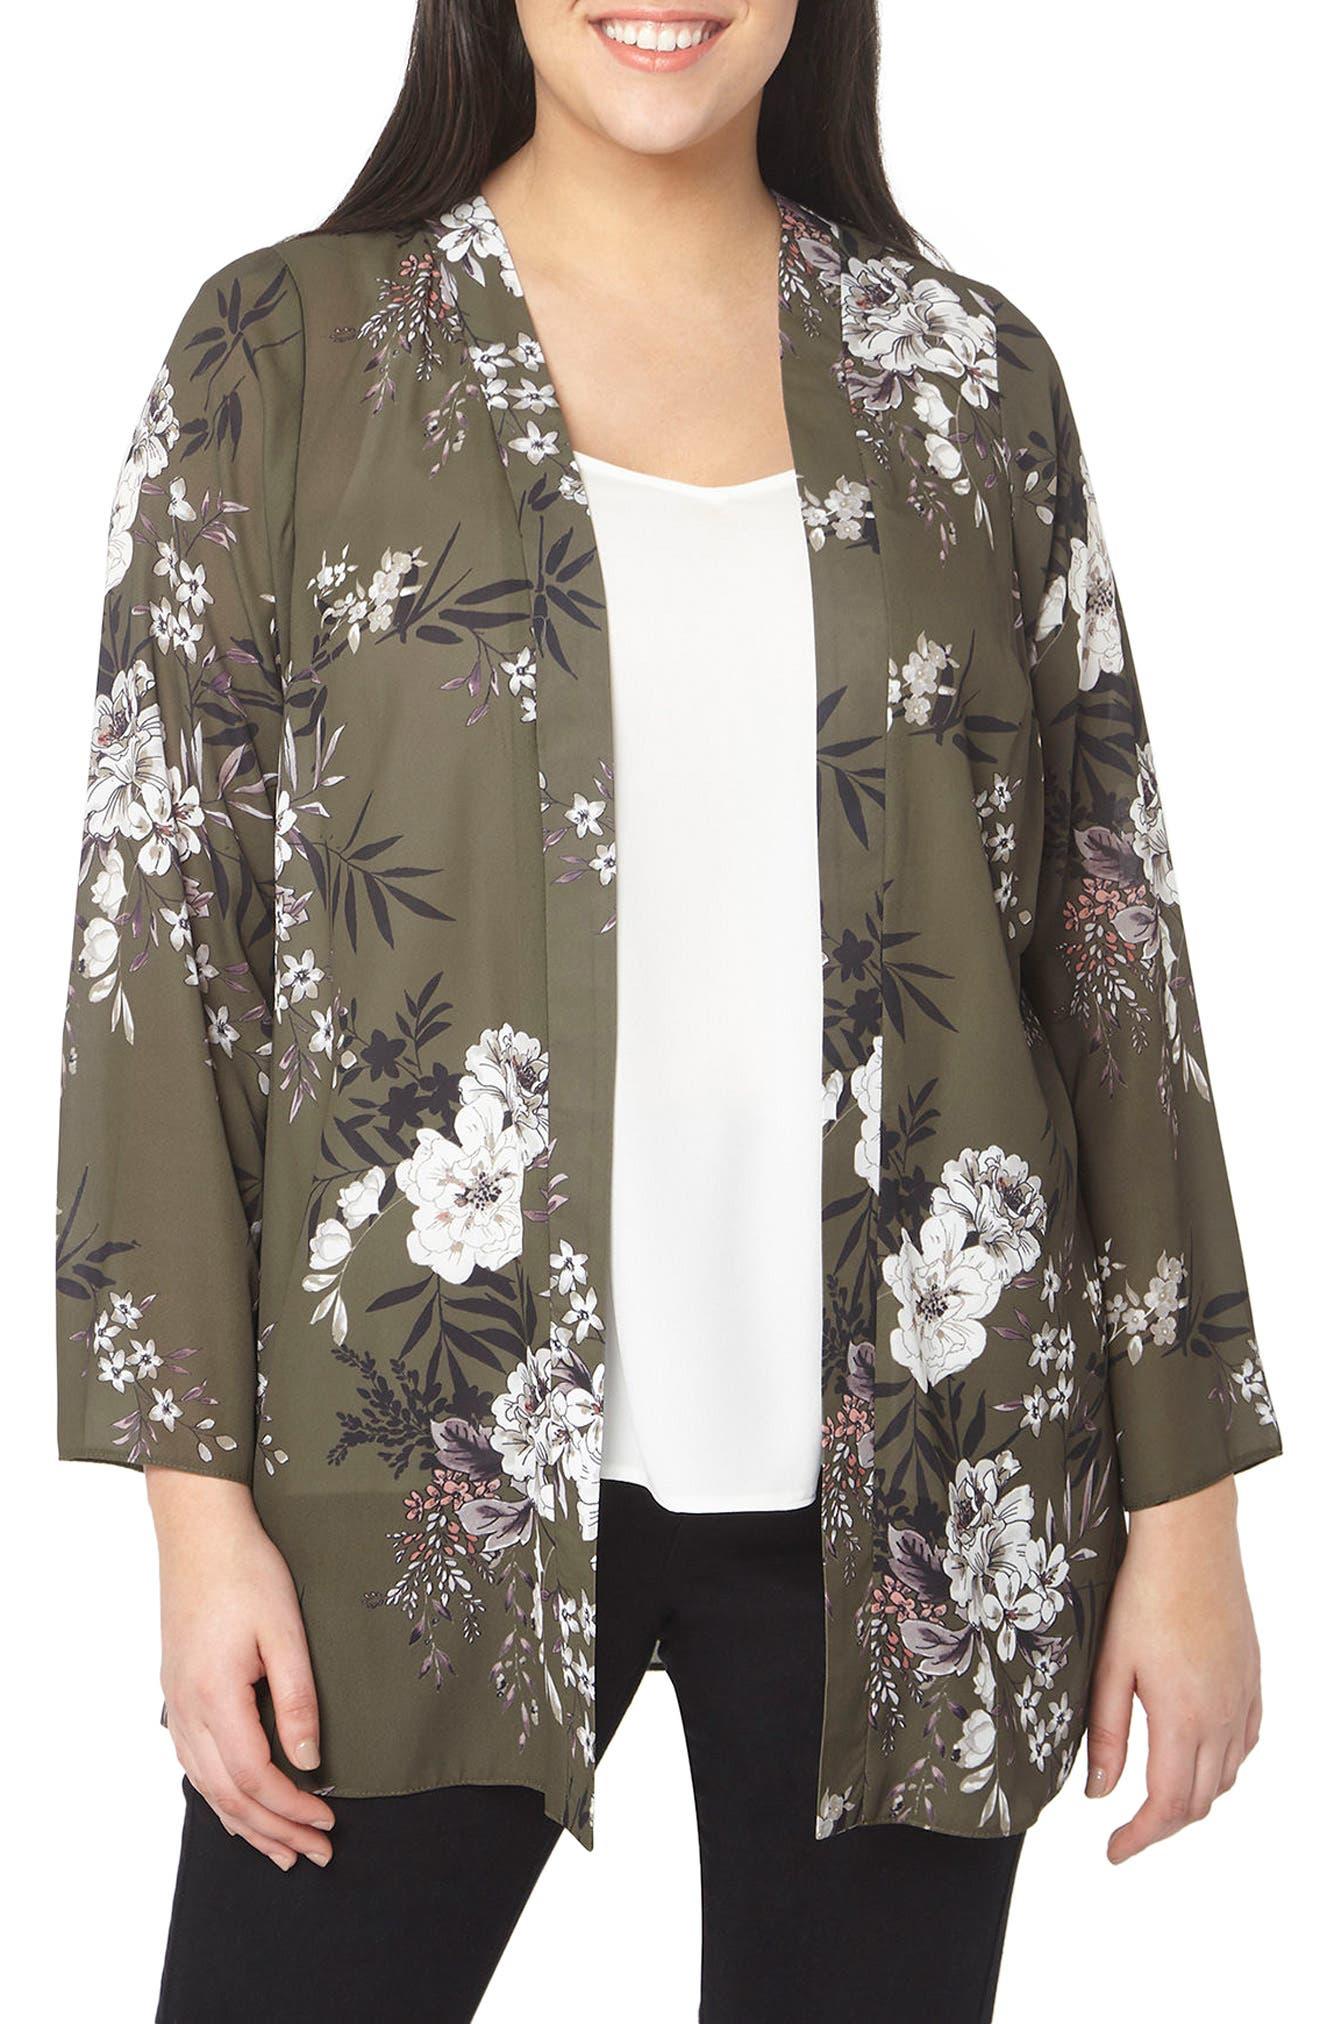 Alternate Image 1 Selected - Evans Floral Print Kimono (Plus Size)